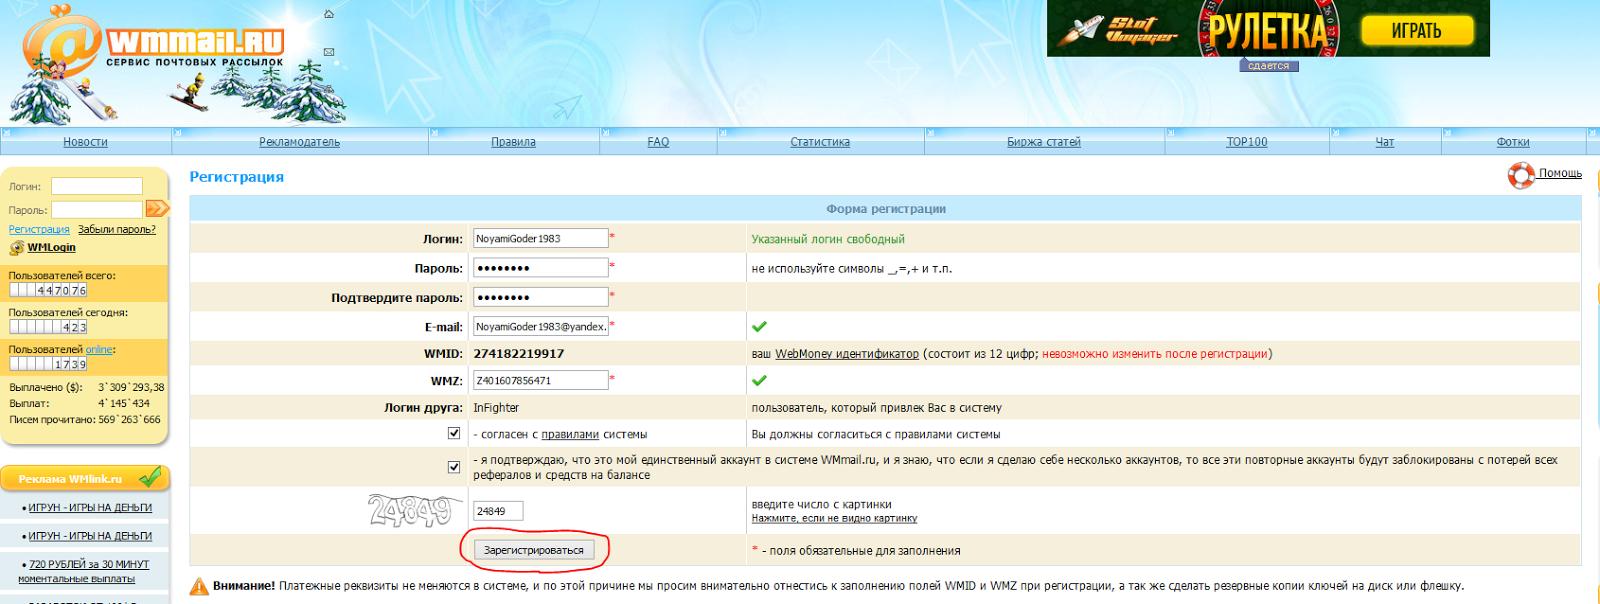 WMmail сайт. Процесс регистрации перед работой на проекте